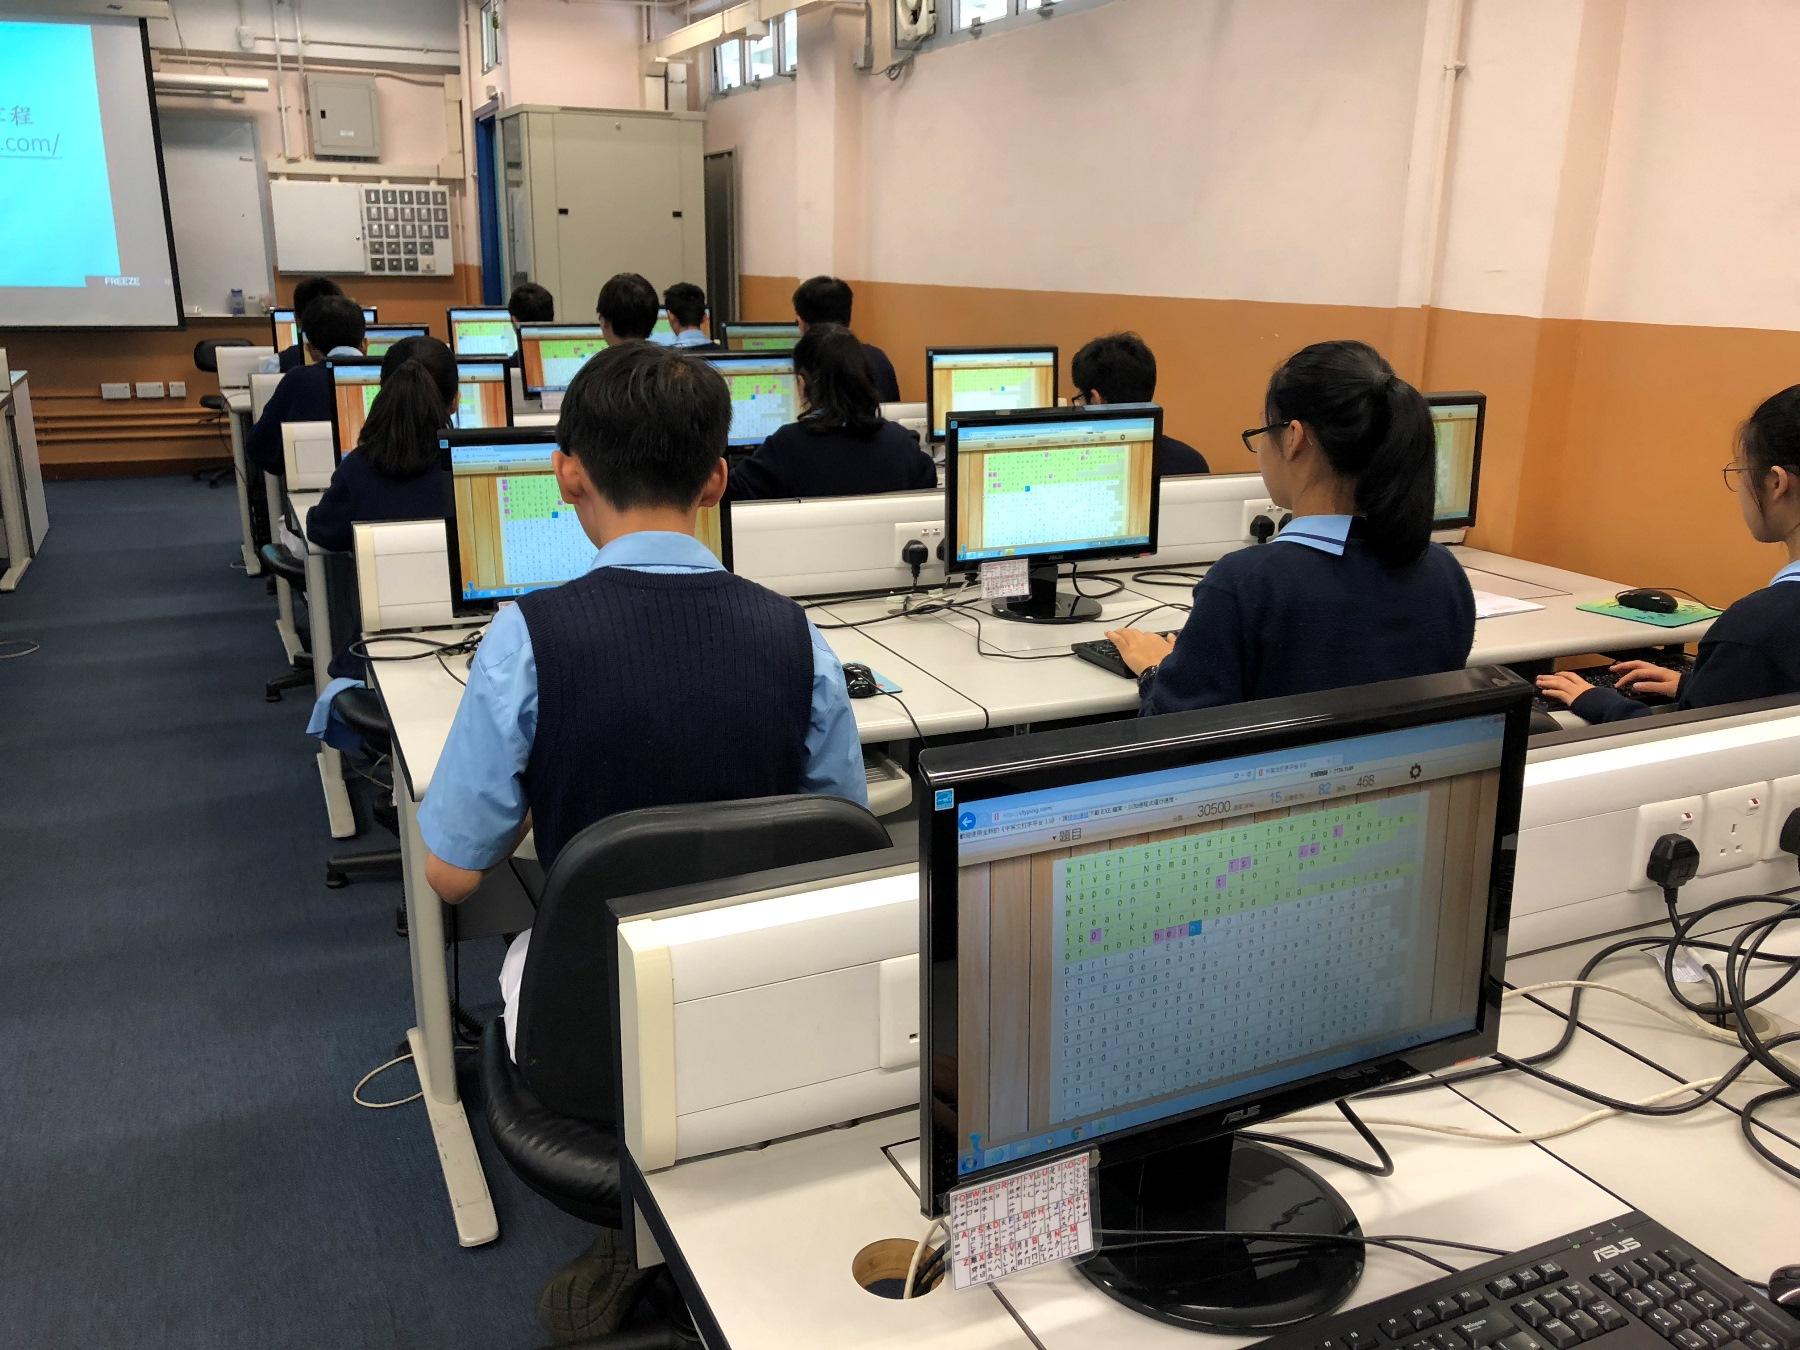 http://npc.edu.hk/sites/default/files/img_0916.jpg